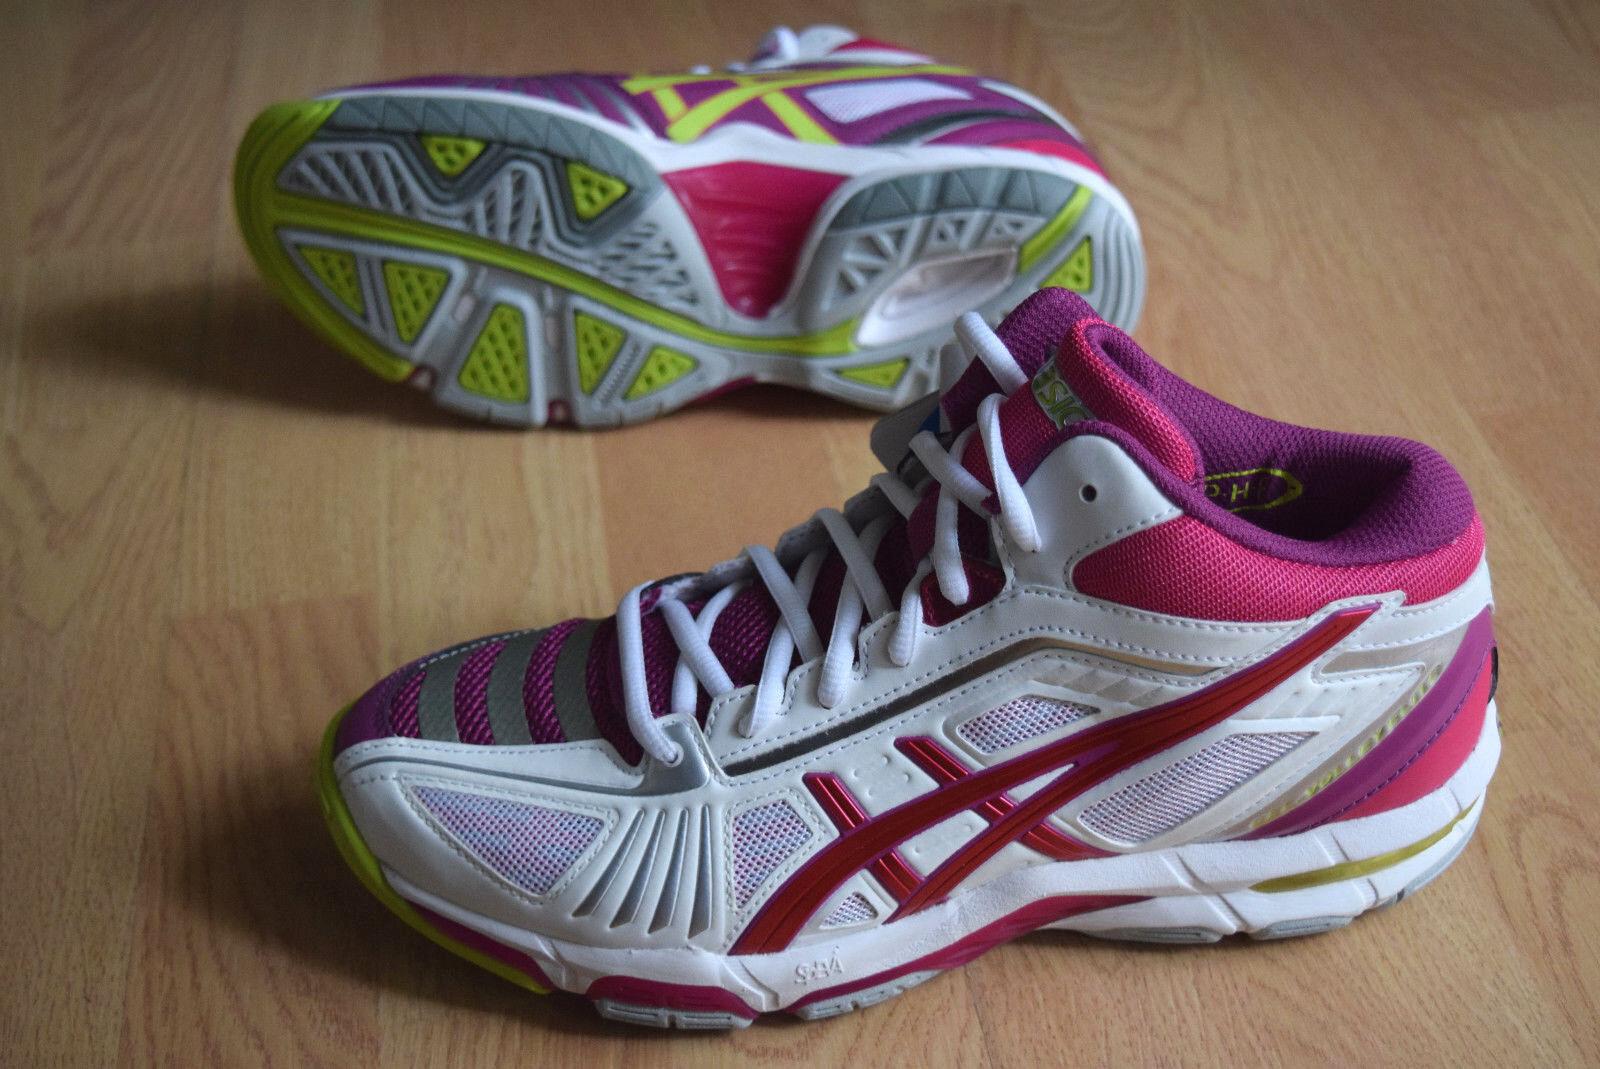 Asics Gel Volley Elite 2 MT 37 38 39 40 41 42 Scarpe da Pallavolo B350N 0125